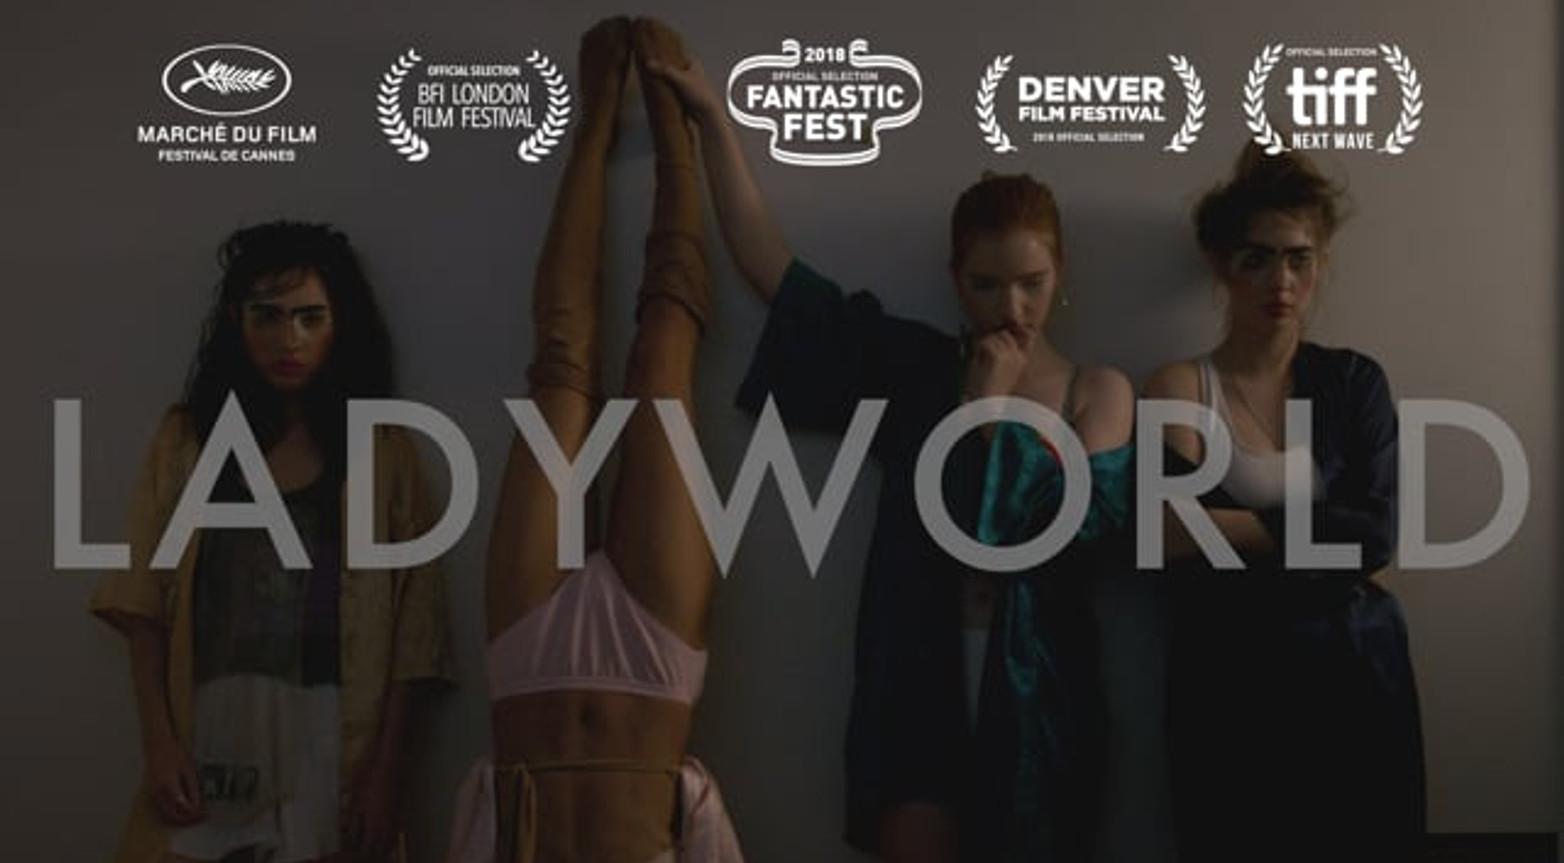 Ladyworld Clip